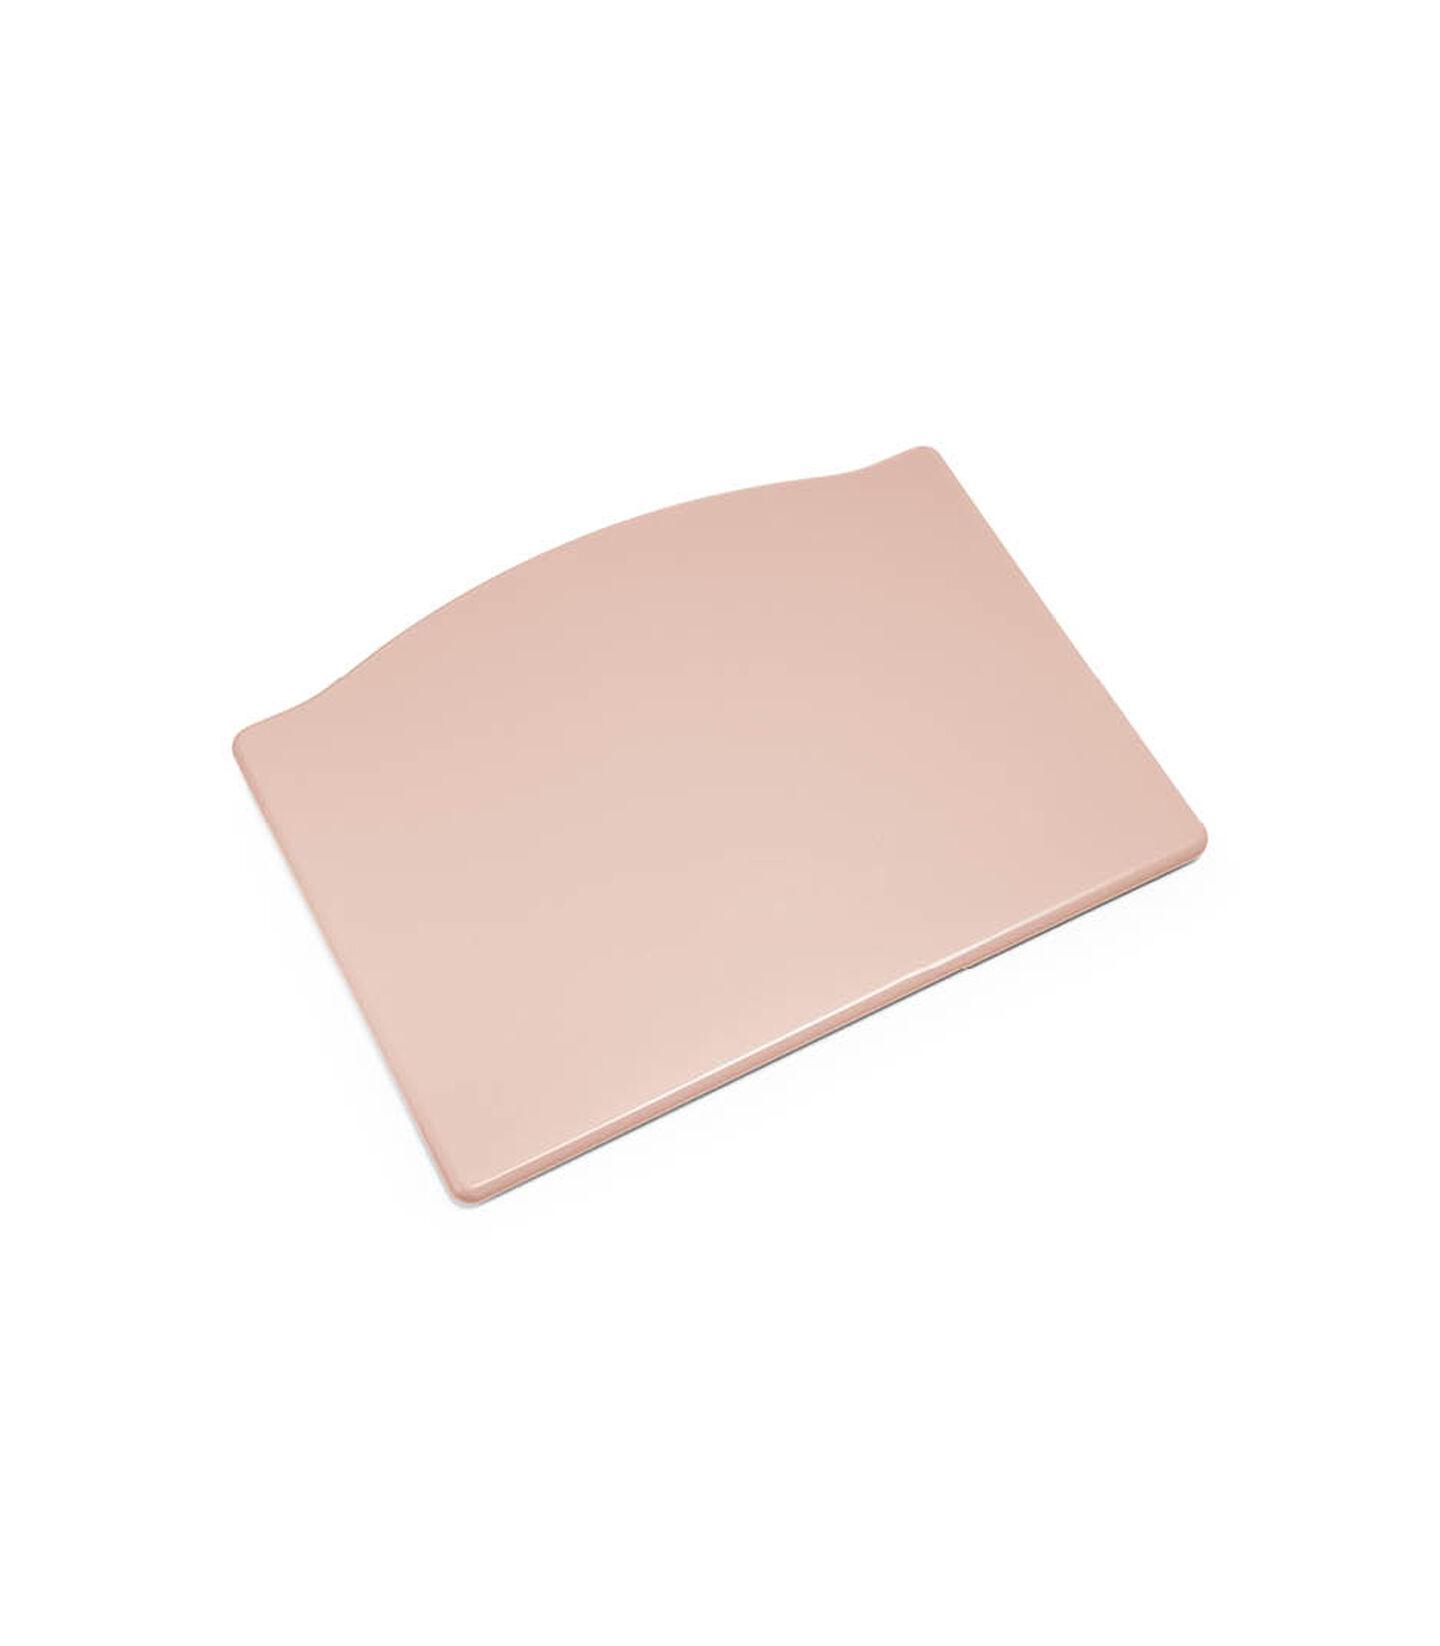 Tripp Trapp® Footplate Serene Pink, Serene Pink, mainview view 1